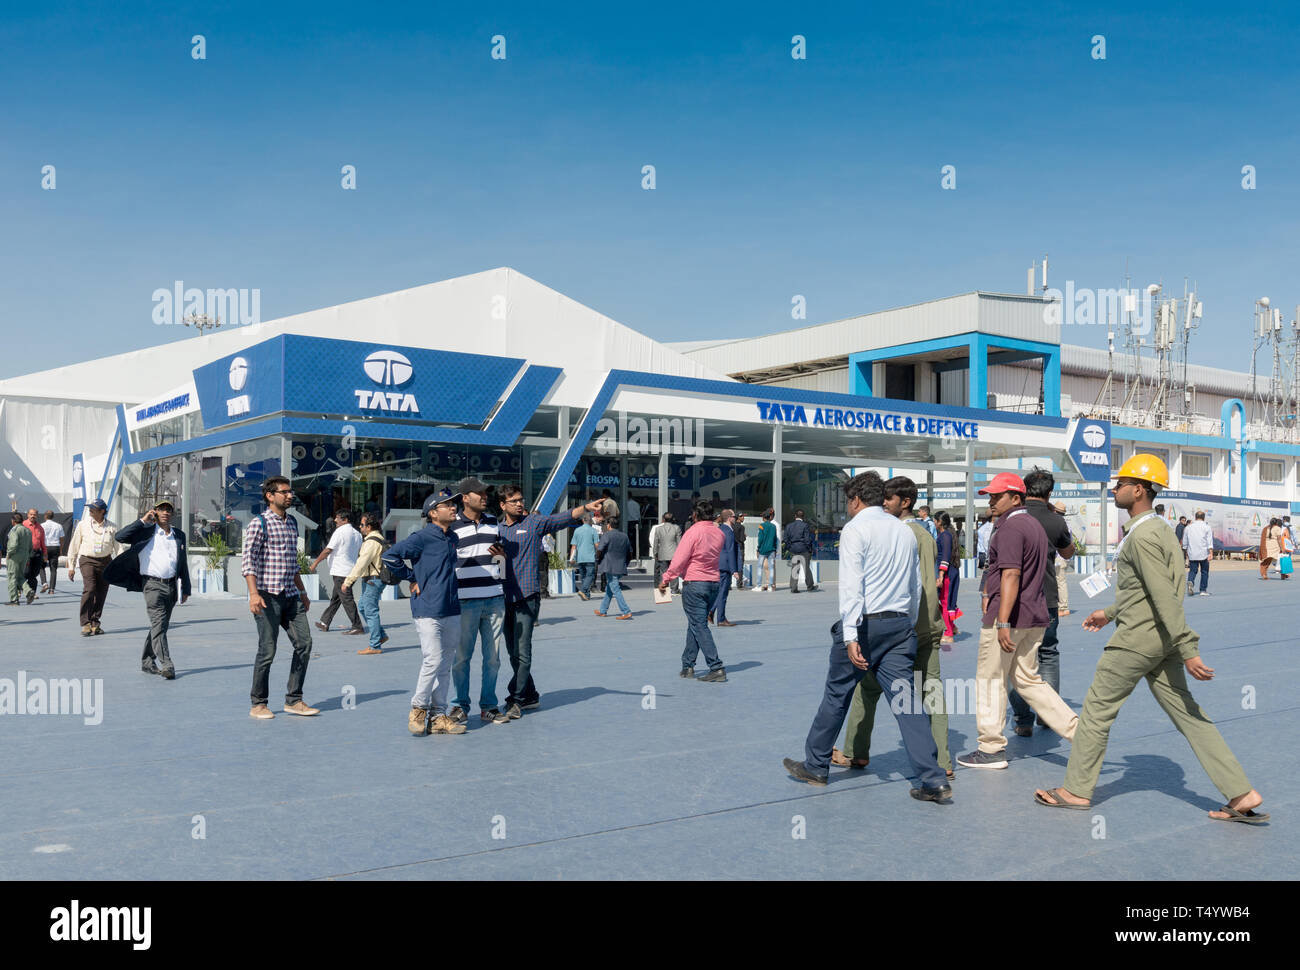 Bengaluru, India - February 22, 2019: Visitors outside the Tata Aerospace stall at the Aero India 2019. Aero India is a biennial air show and aviation - Stock Image